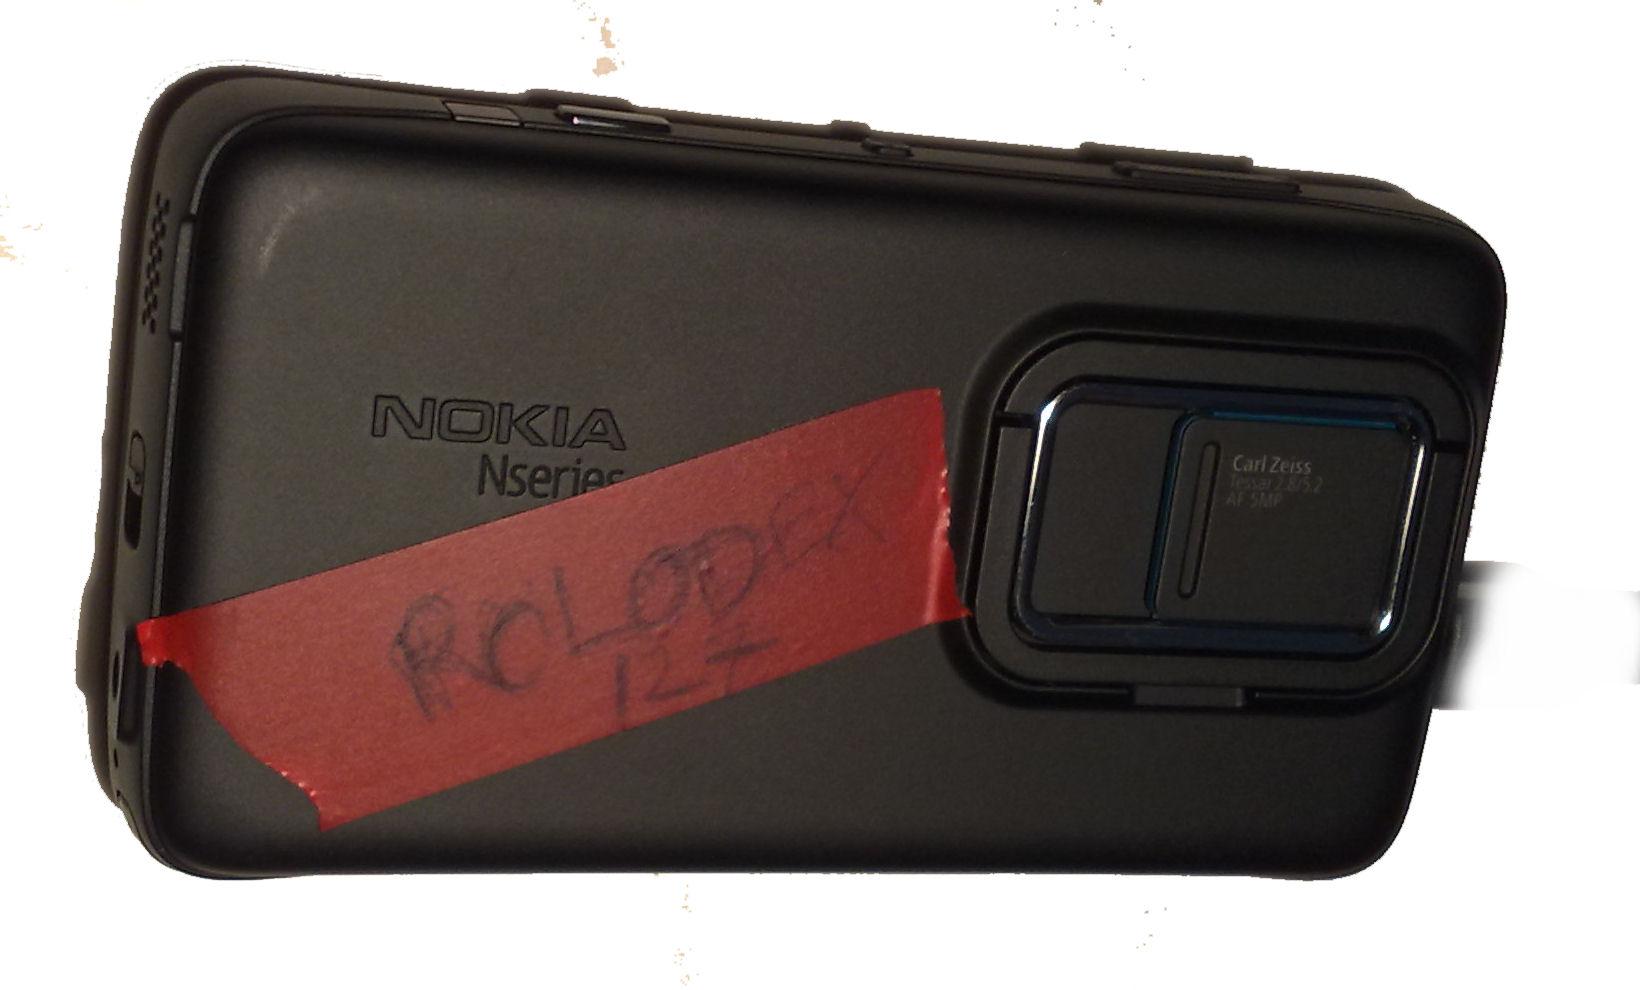 N900 4